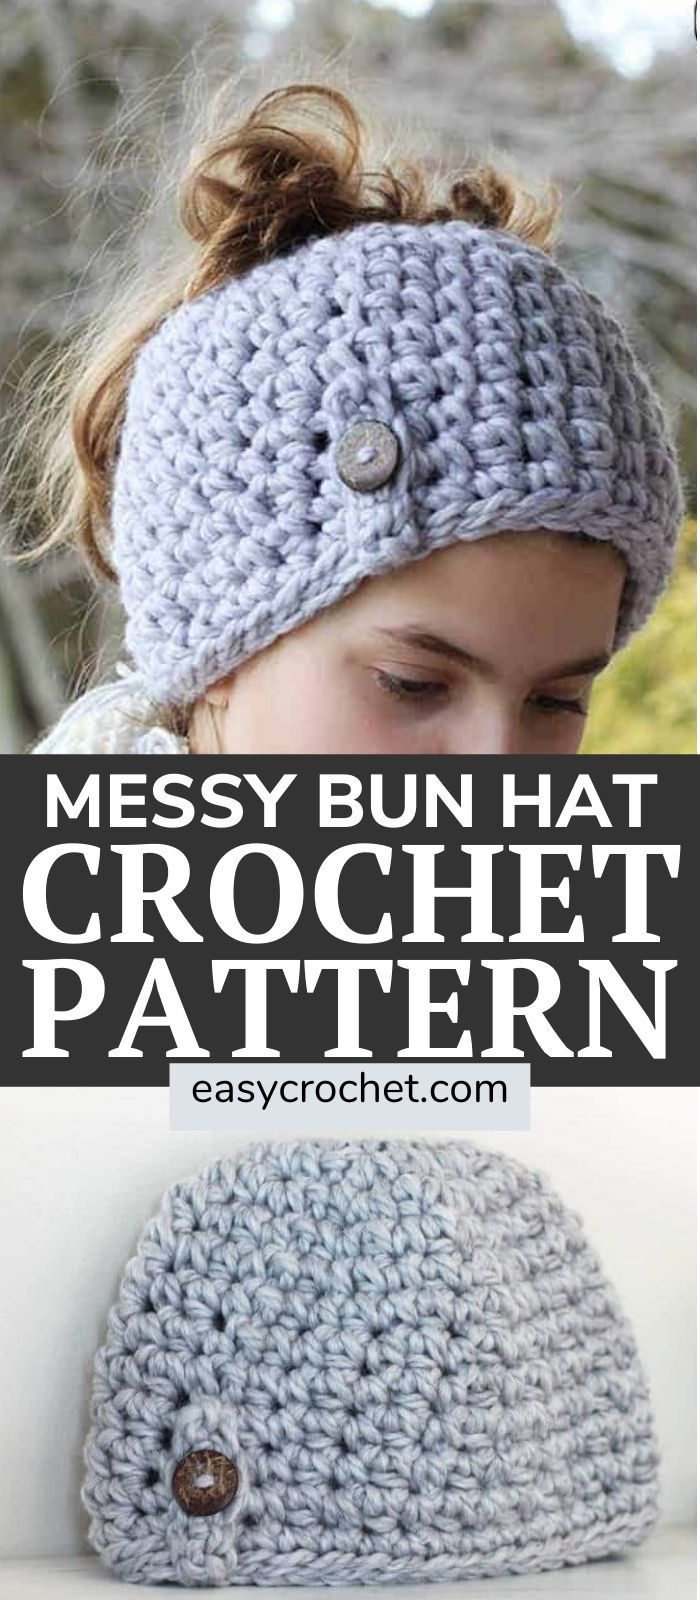 Messy Bun Hat Pattern via easycrochetcom   Messy bun hat pattern ...